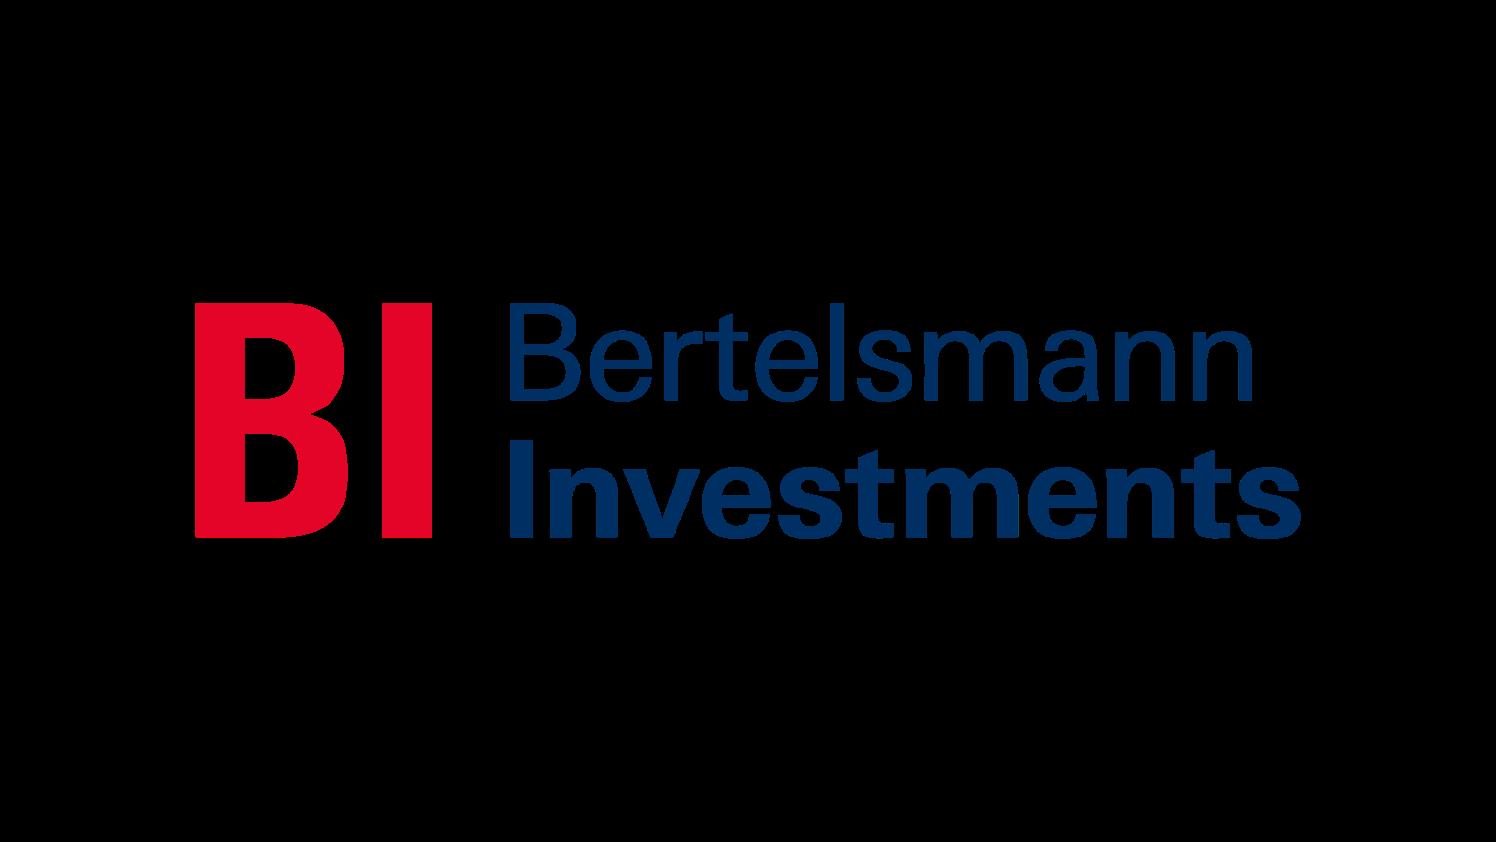 bertelsmann investments bertelsmann se co kgaa